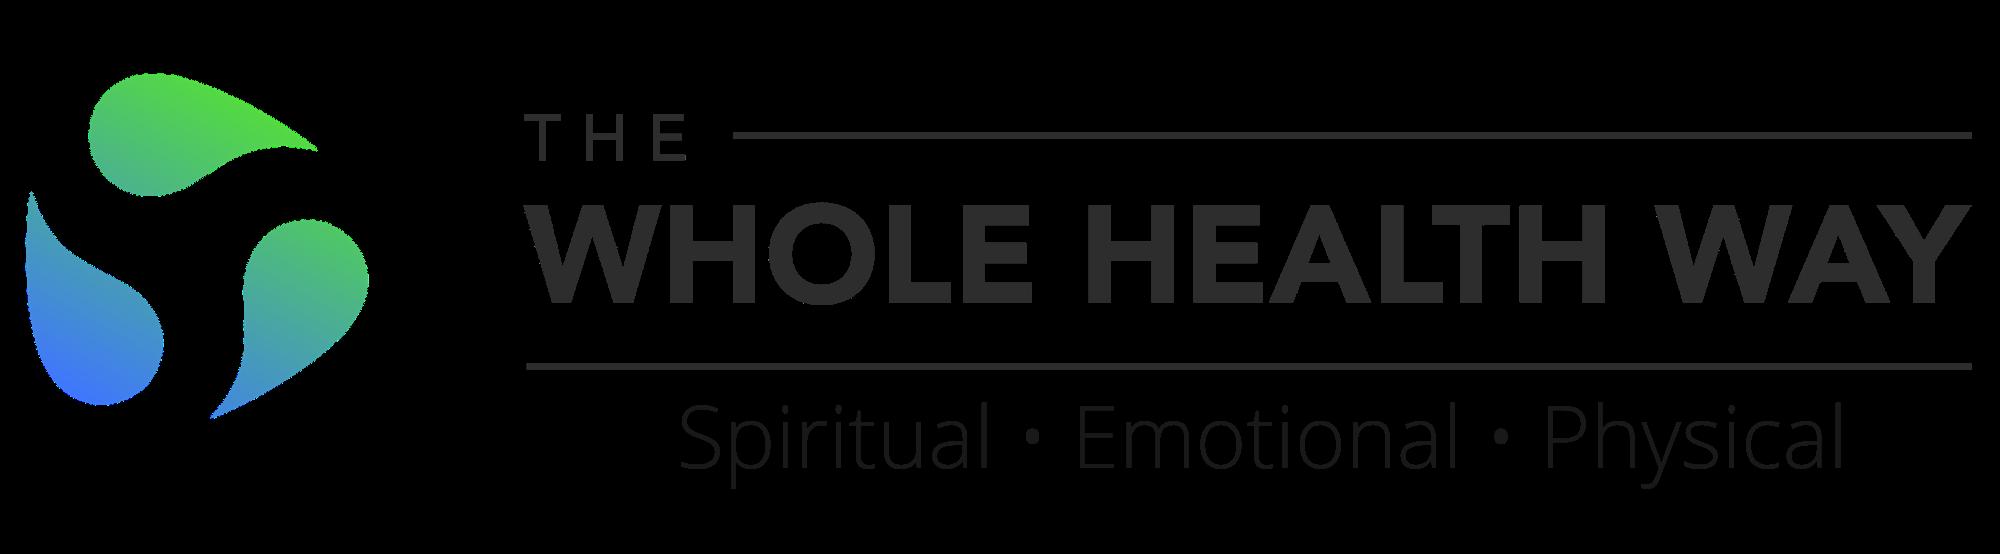 The Whole Health Way